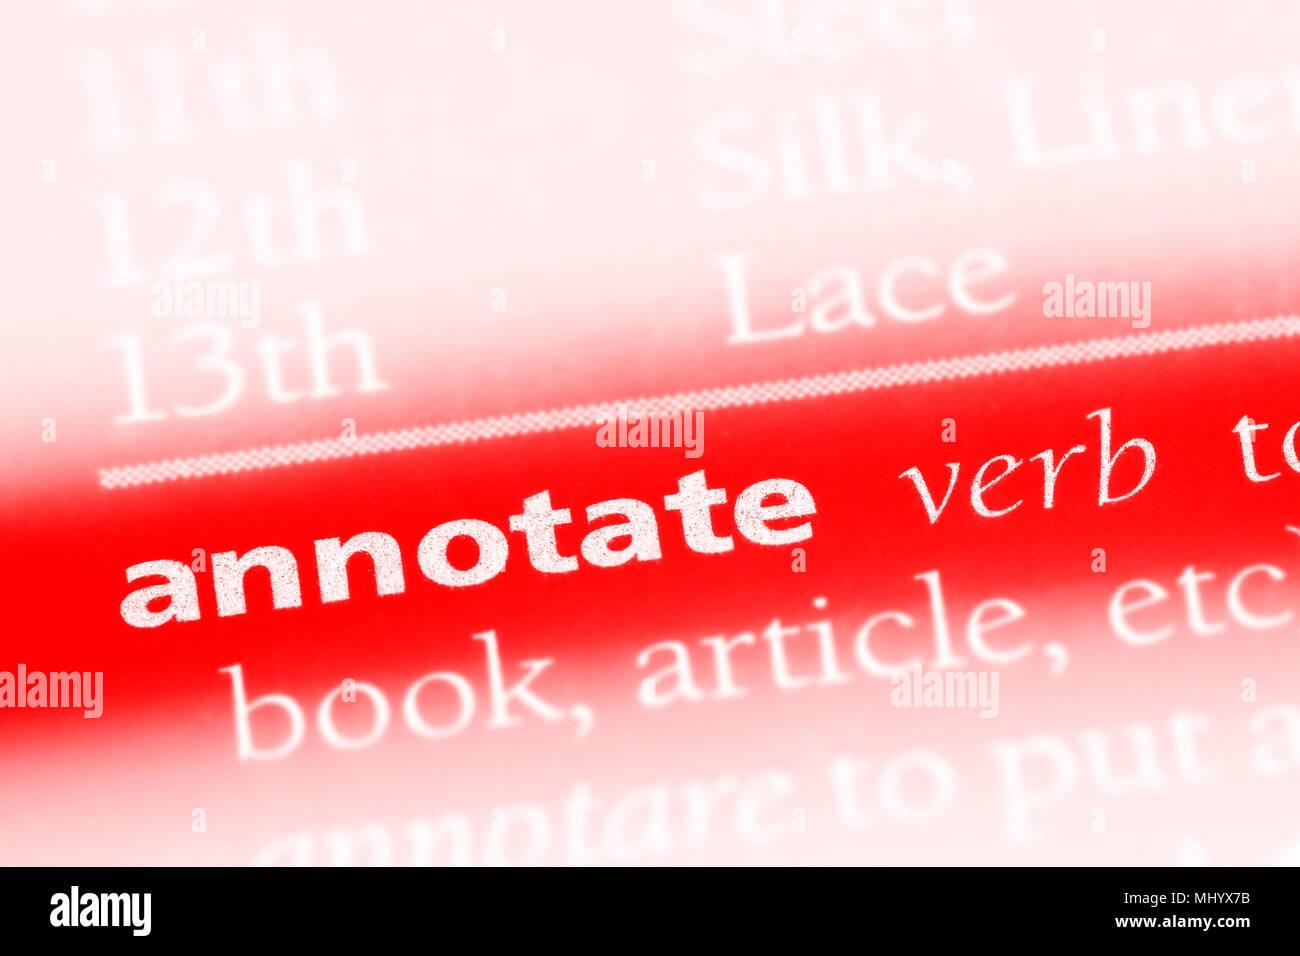 Annotate Stock Photos & Annotate Stock Images - Alamy